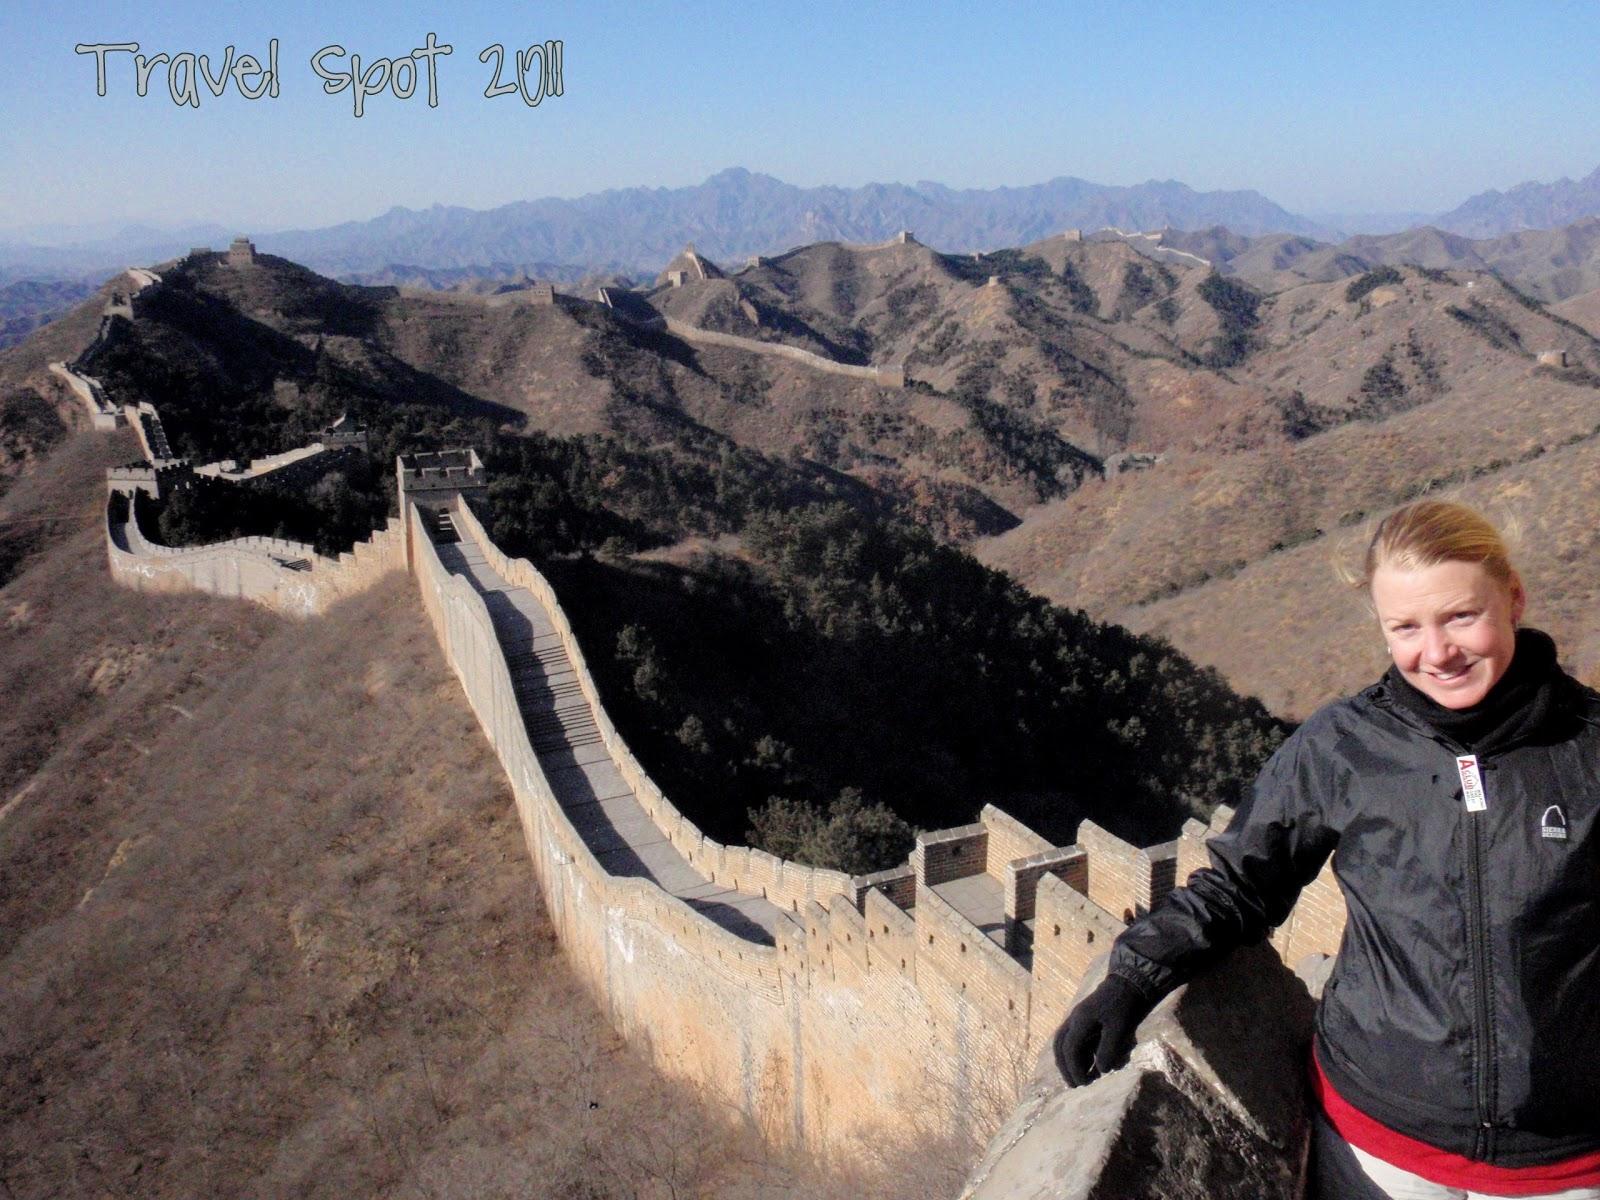 http://4.bp.blogspot.com/-PNaC9Dwp4B8/TumlKaXGWII/AAAAAAAACSY/GEgHJ9hTXVc/s1600/China+-+Beijing+-+Great+Wall-96.JPG